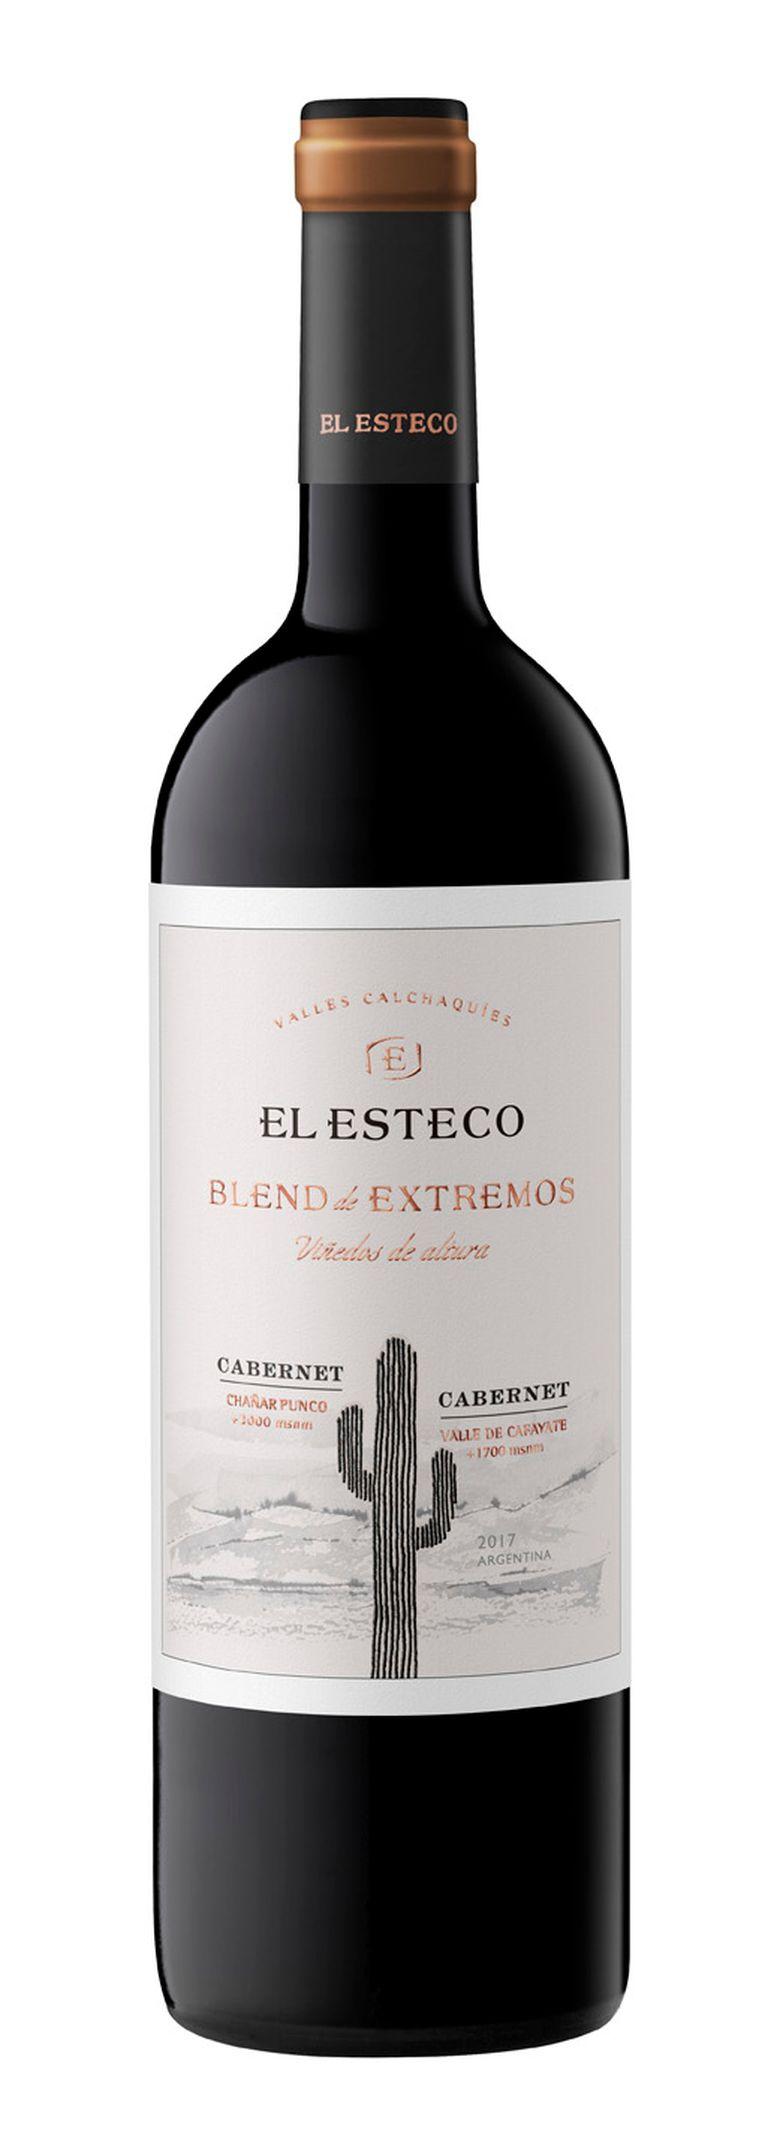 El Esteco Blend de Extremos Cabernet Sauvignon